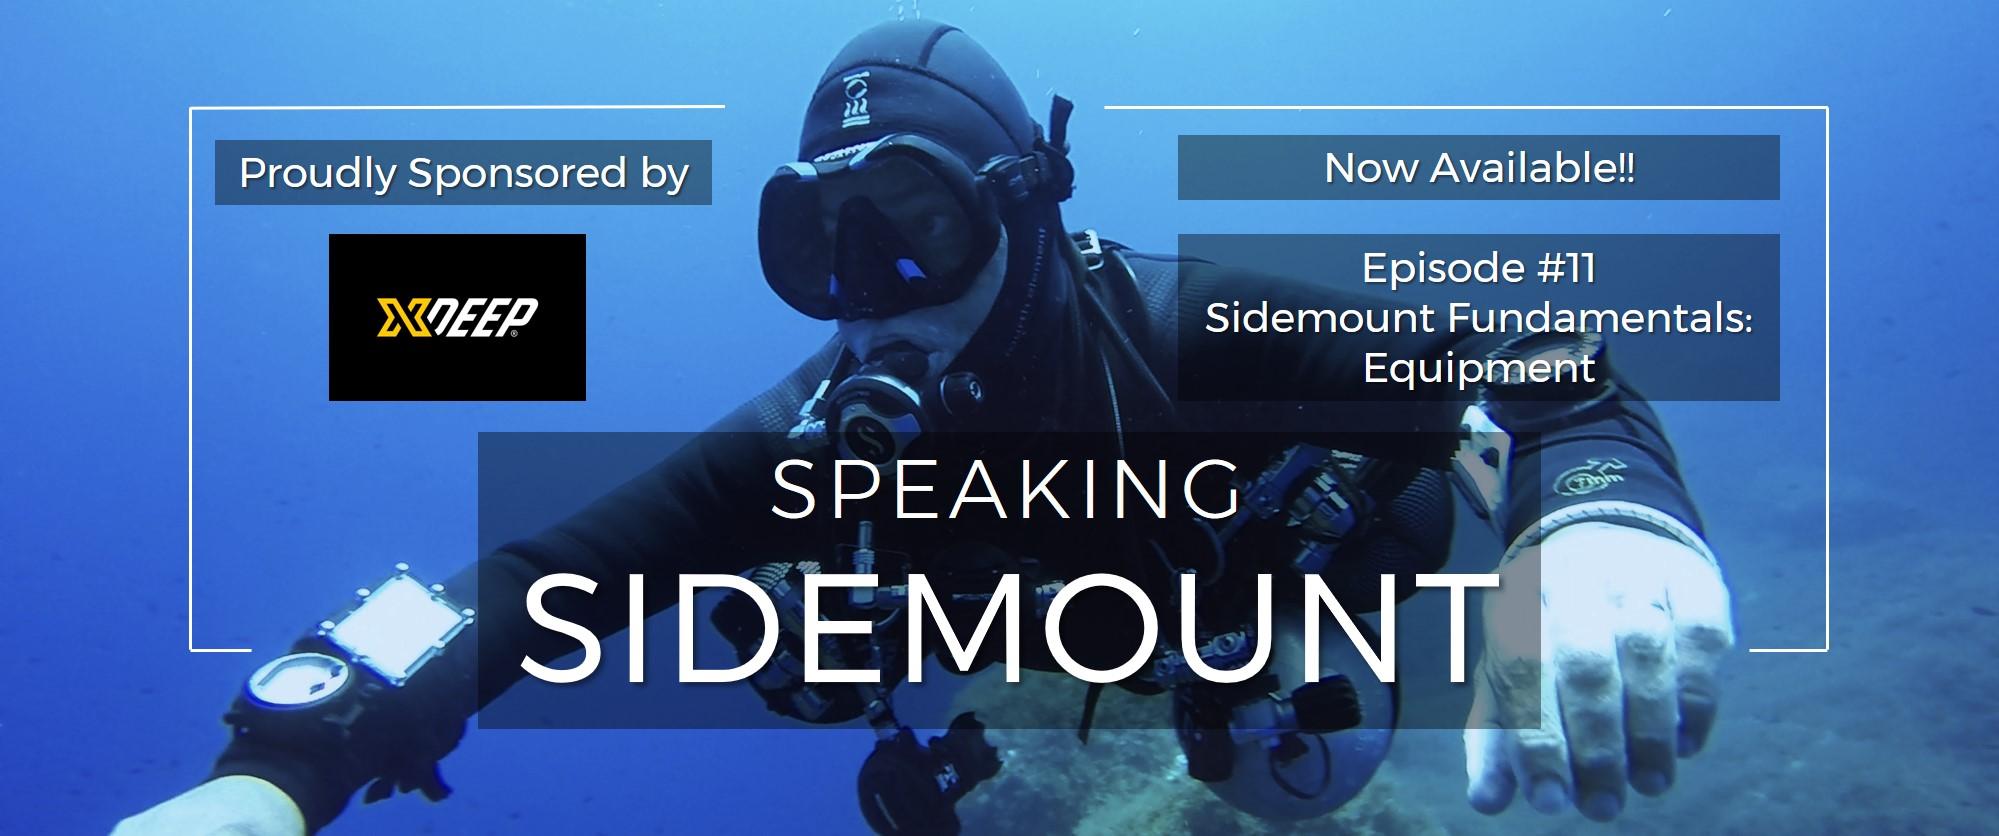 Speaking Sidemount Cover 1920x480 (Ep11 xDEEP).jpg